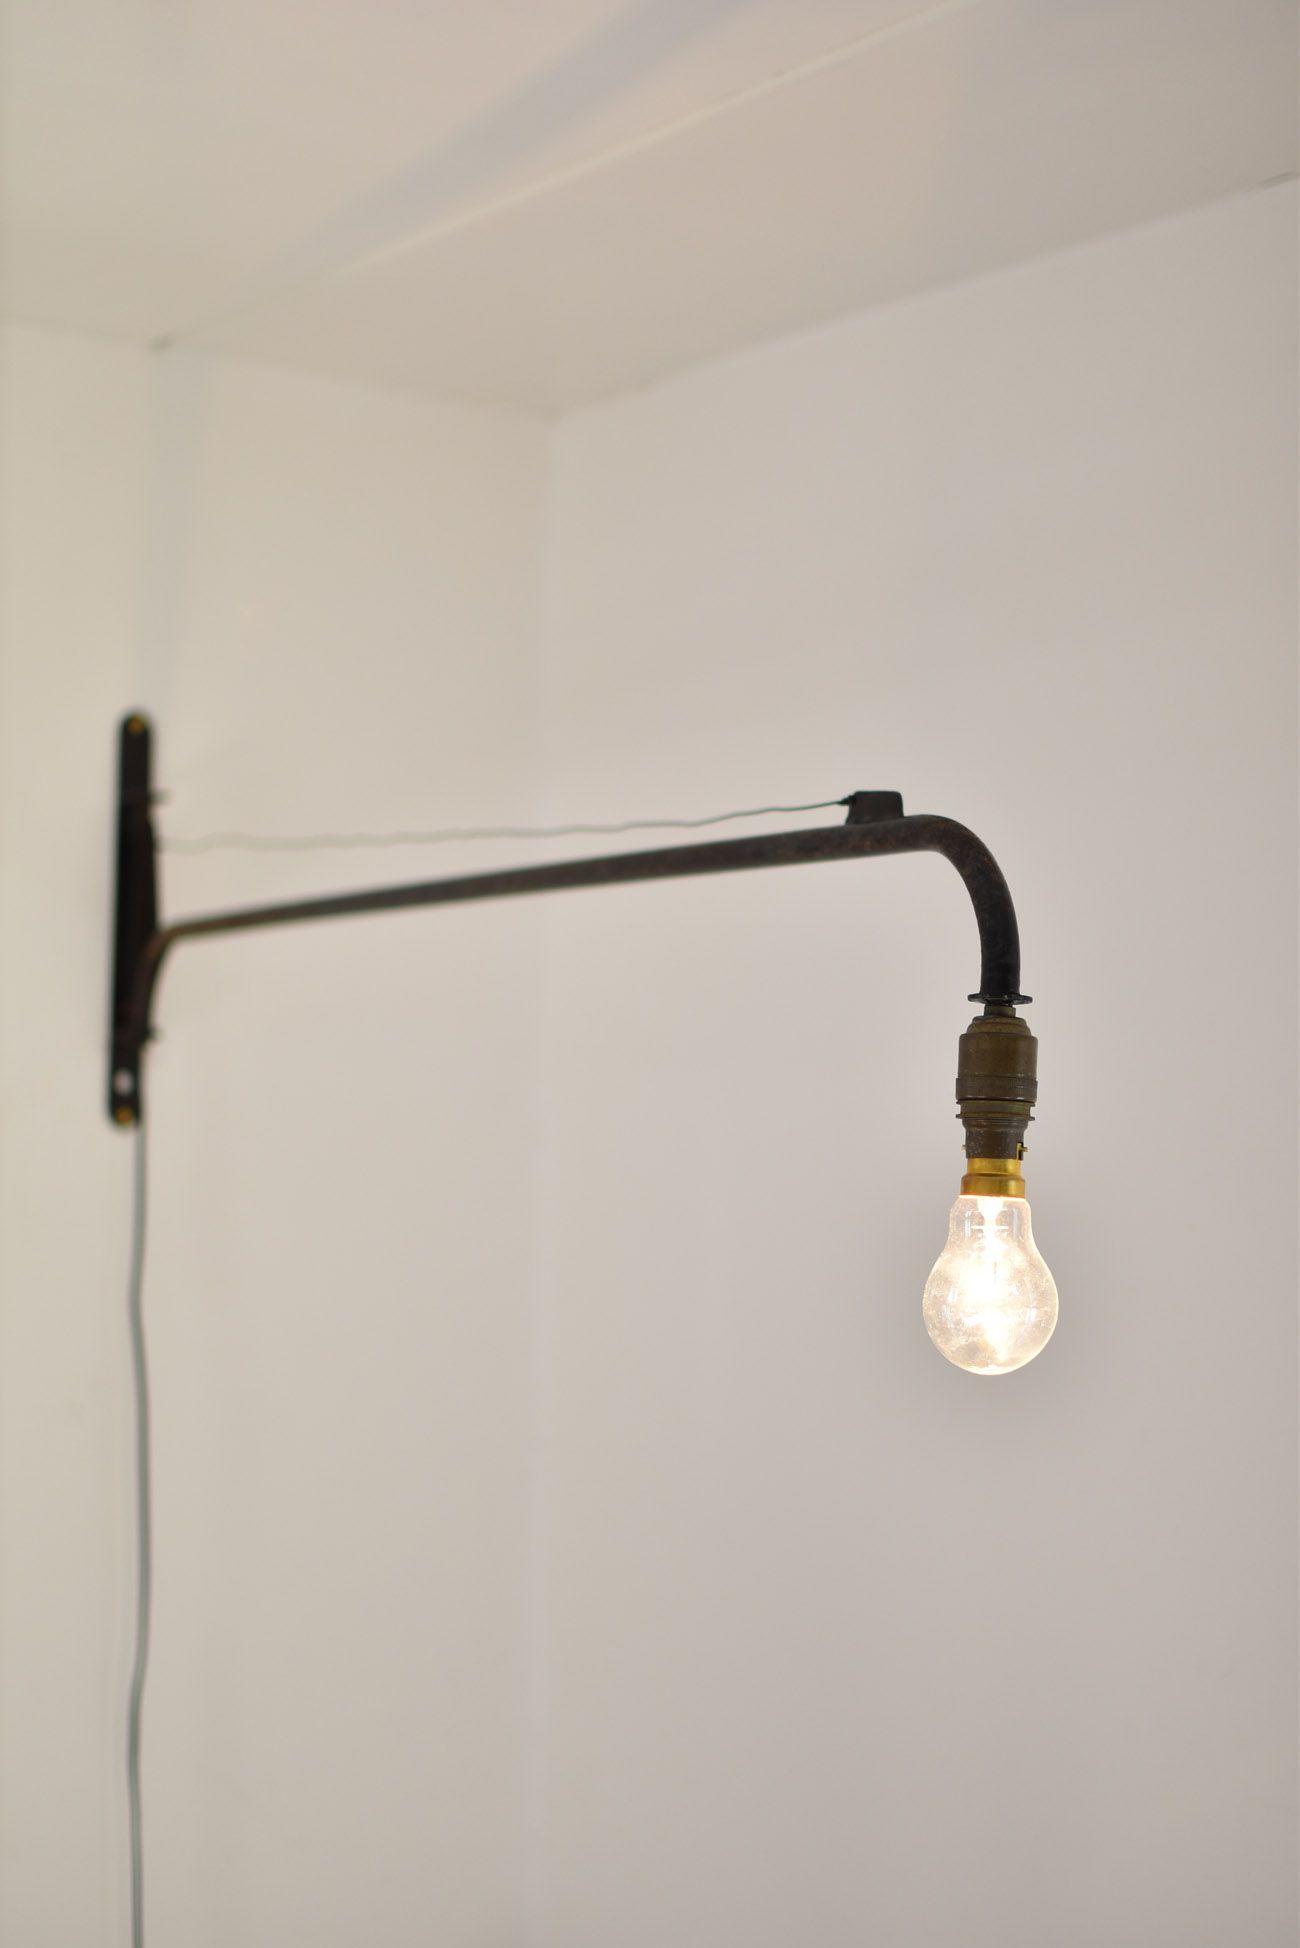 Gallery Yaichi X2f Antique X2f Lamp X2f Potence Swing Jib Lamp